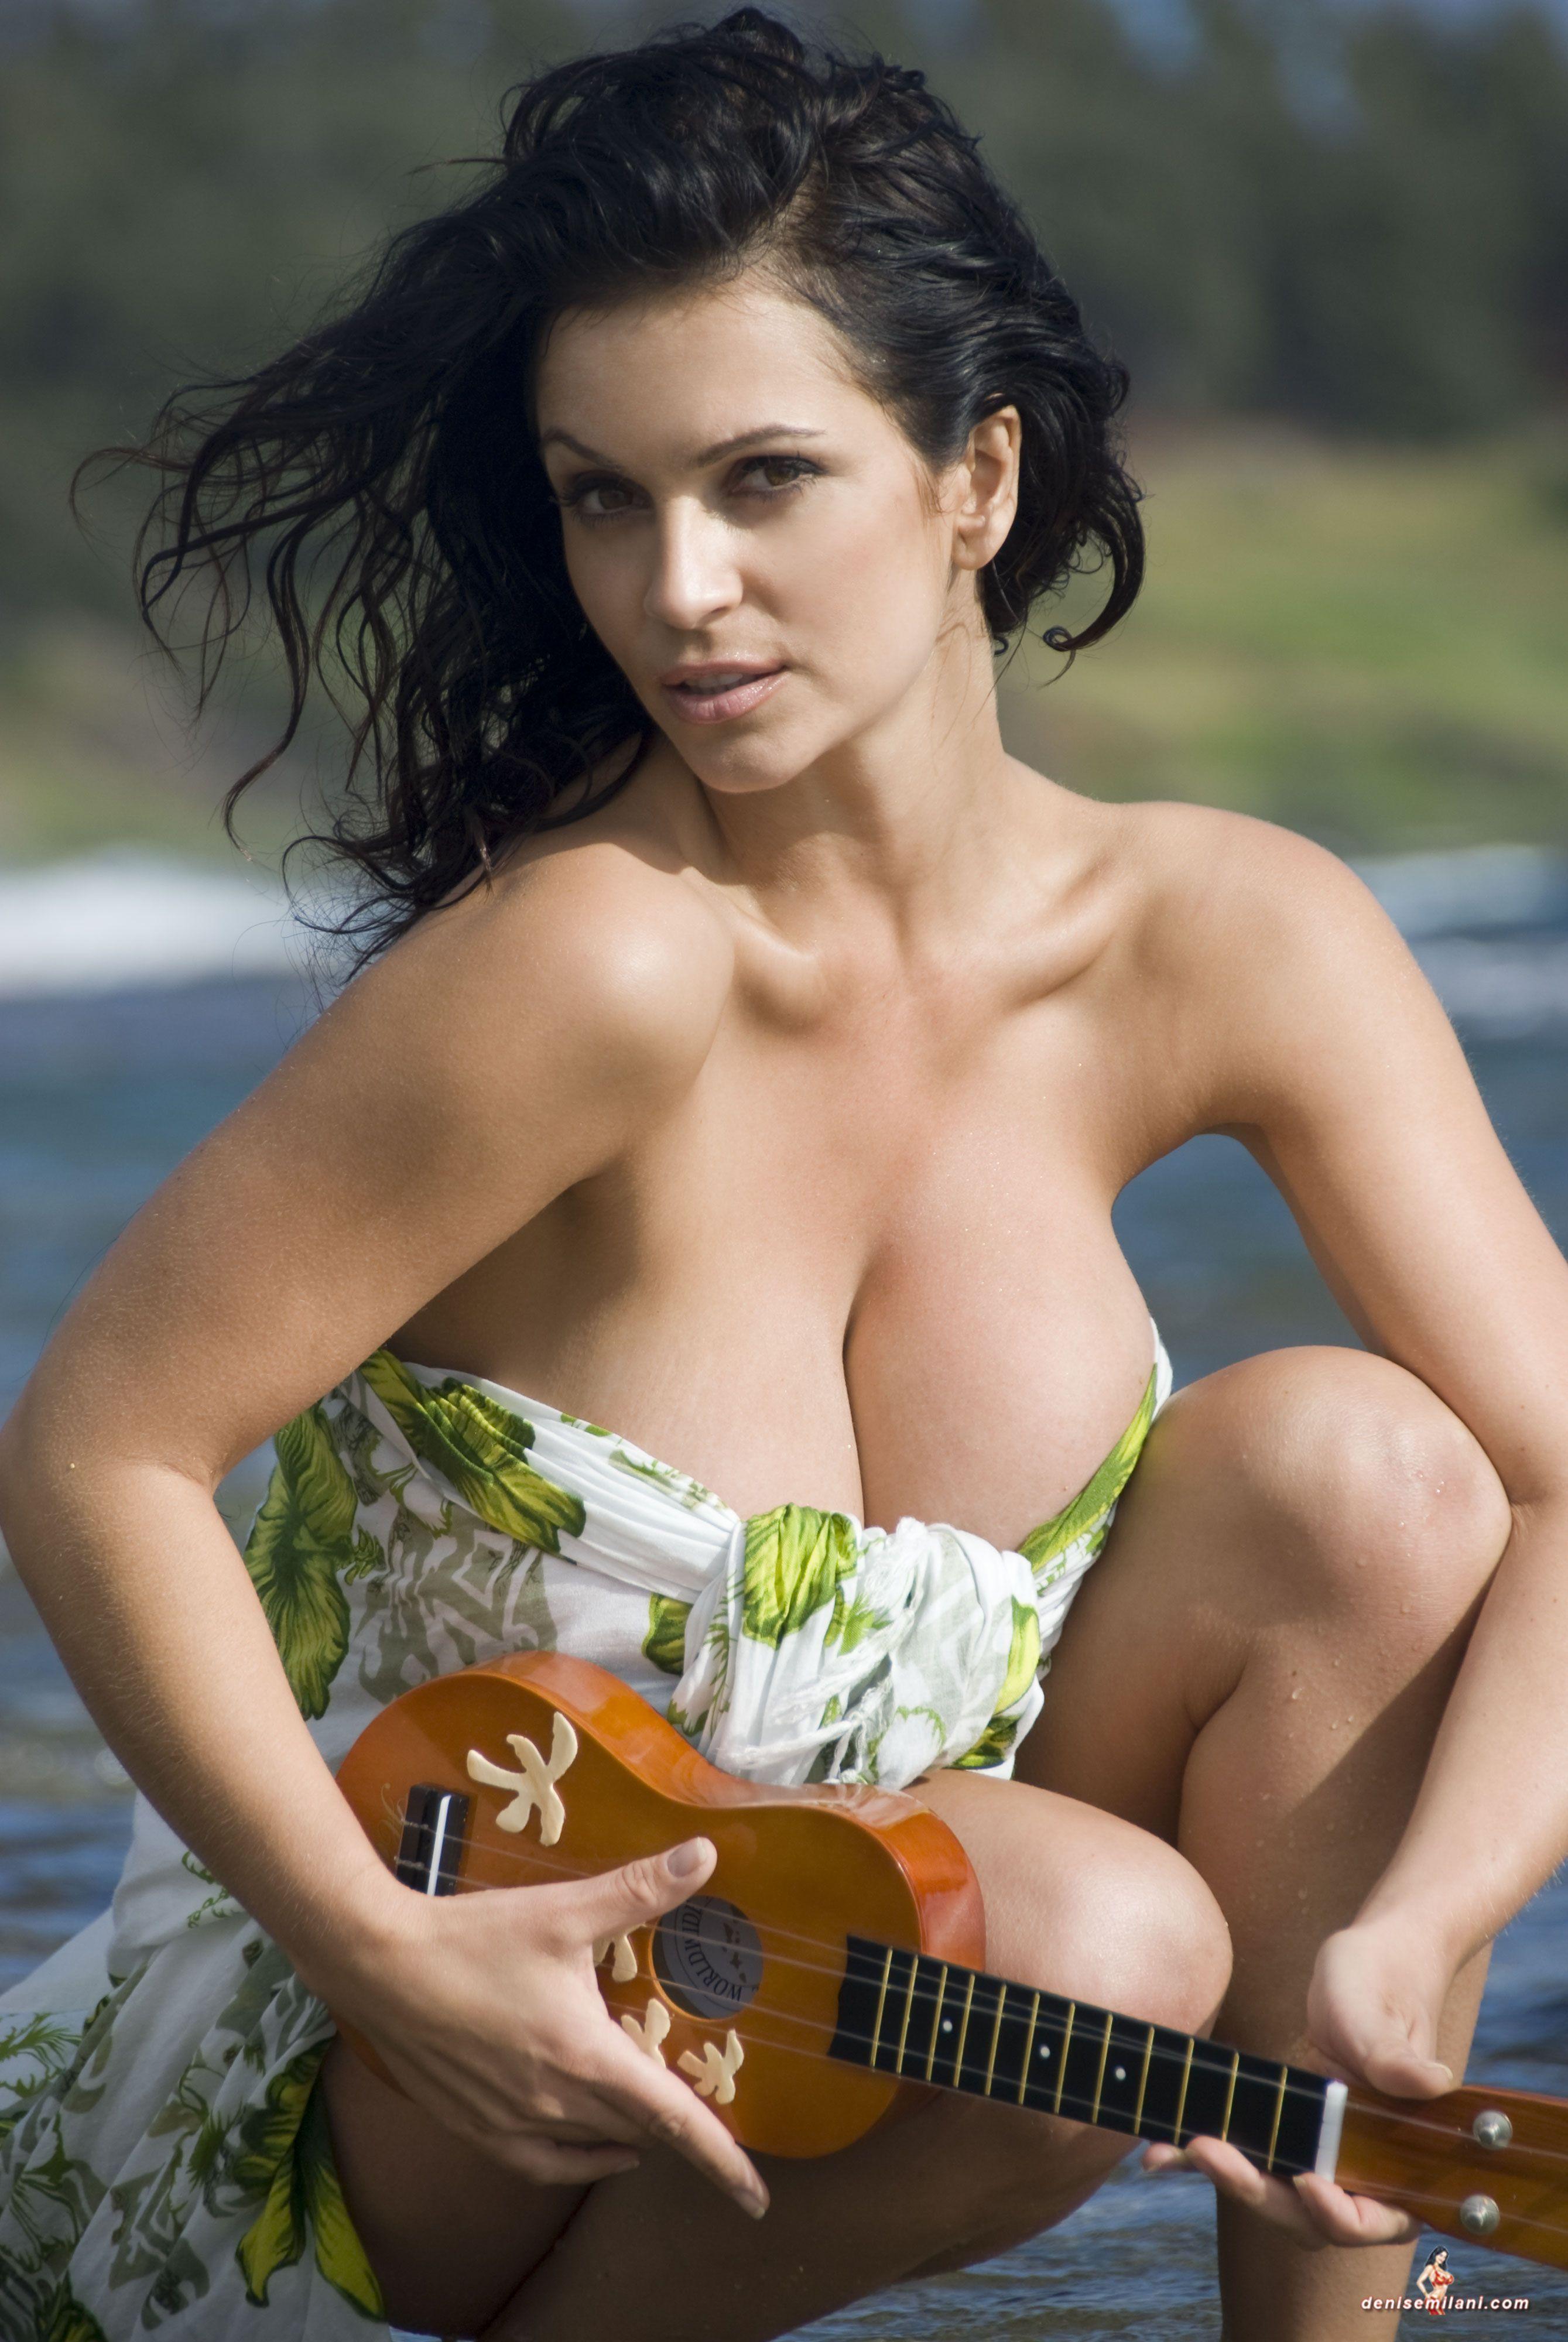 Think, Denise milani hot bikini excellent phrase